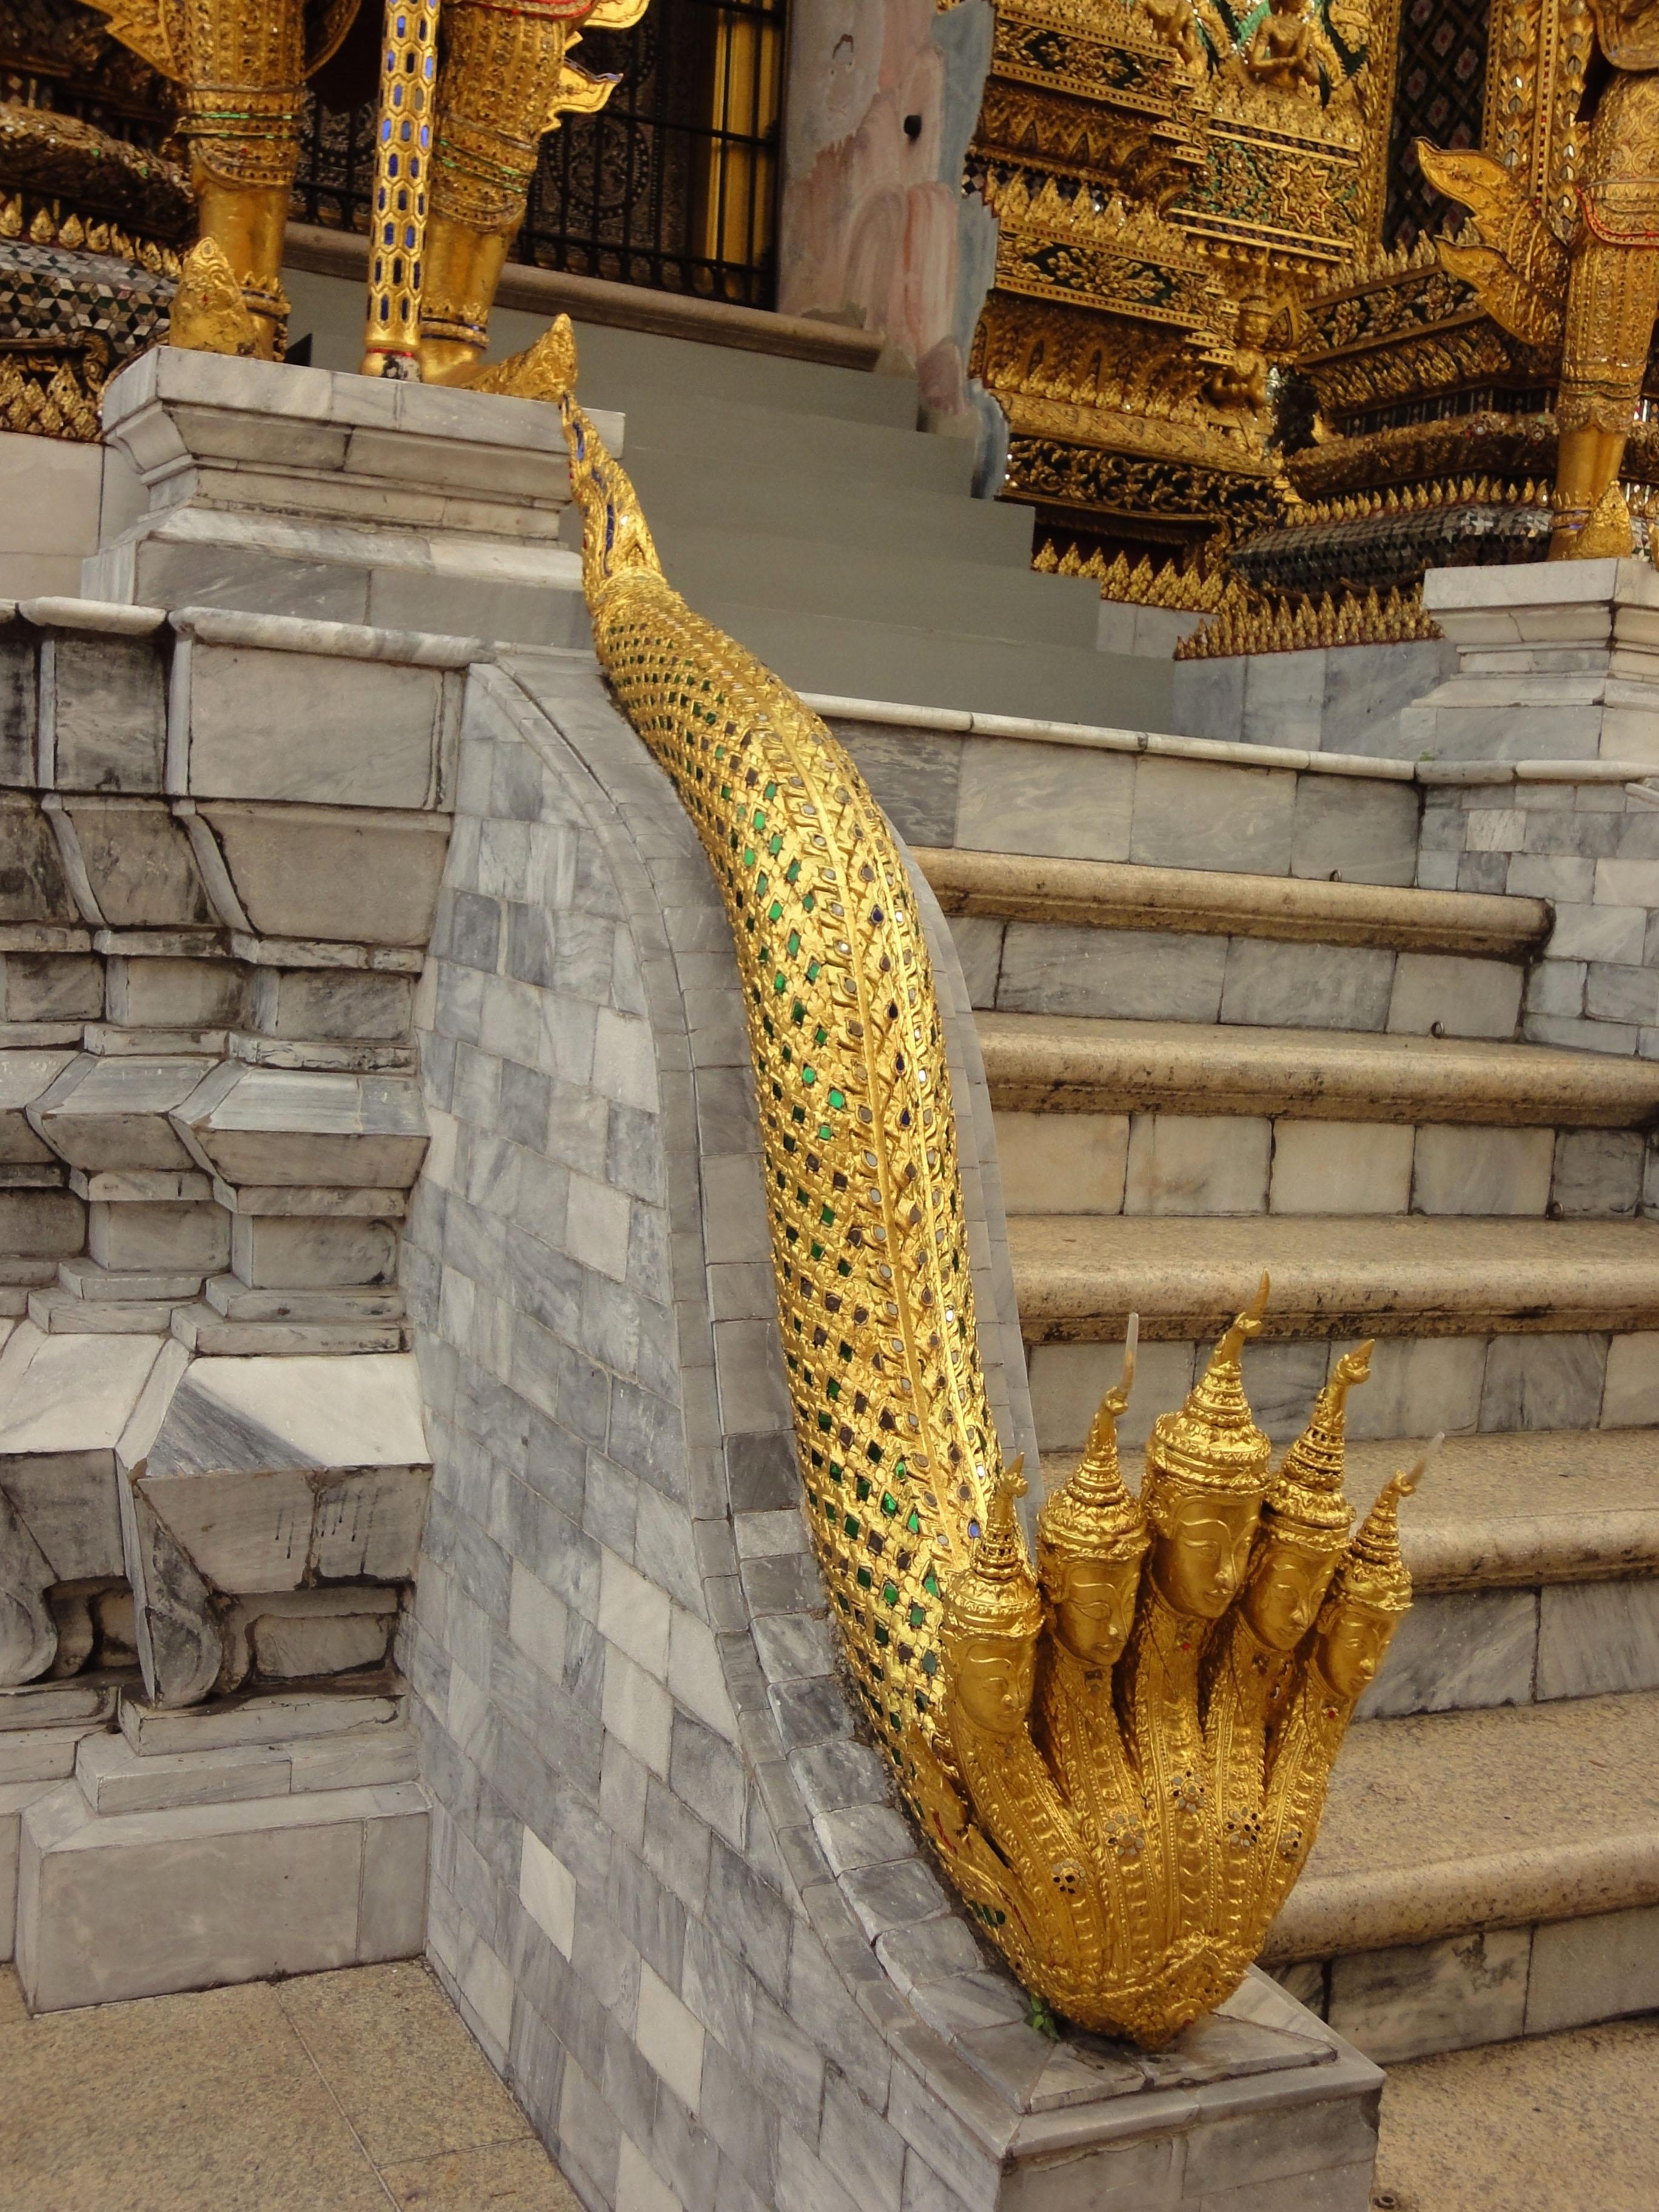 07 Phra Mondop dragon stairs Grand Palace Bangkok 2010 02